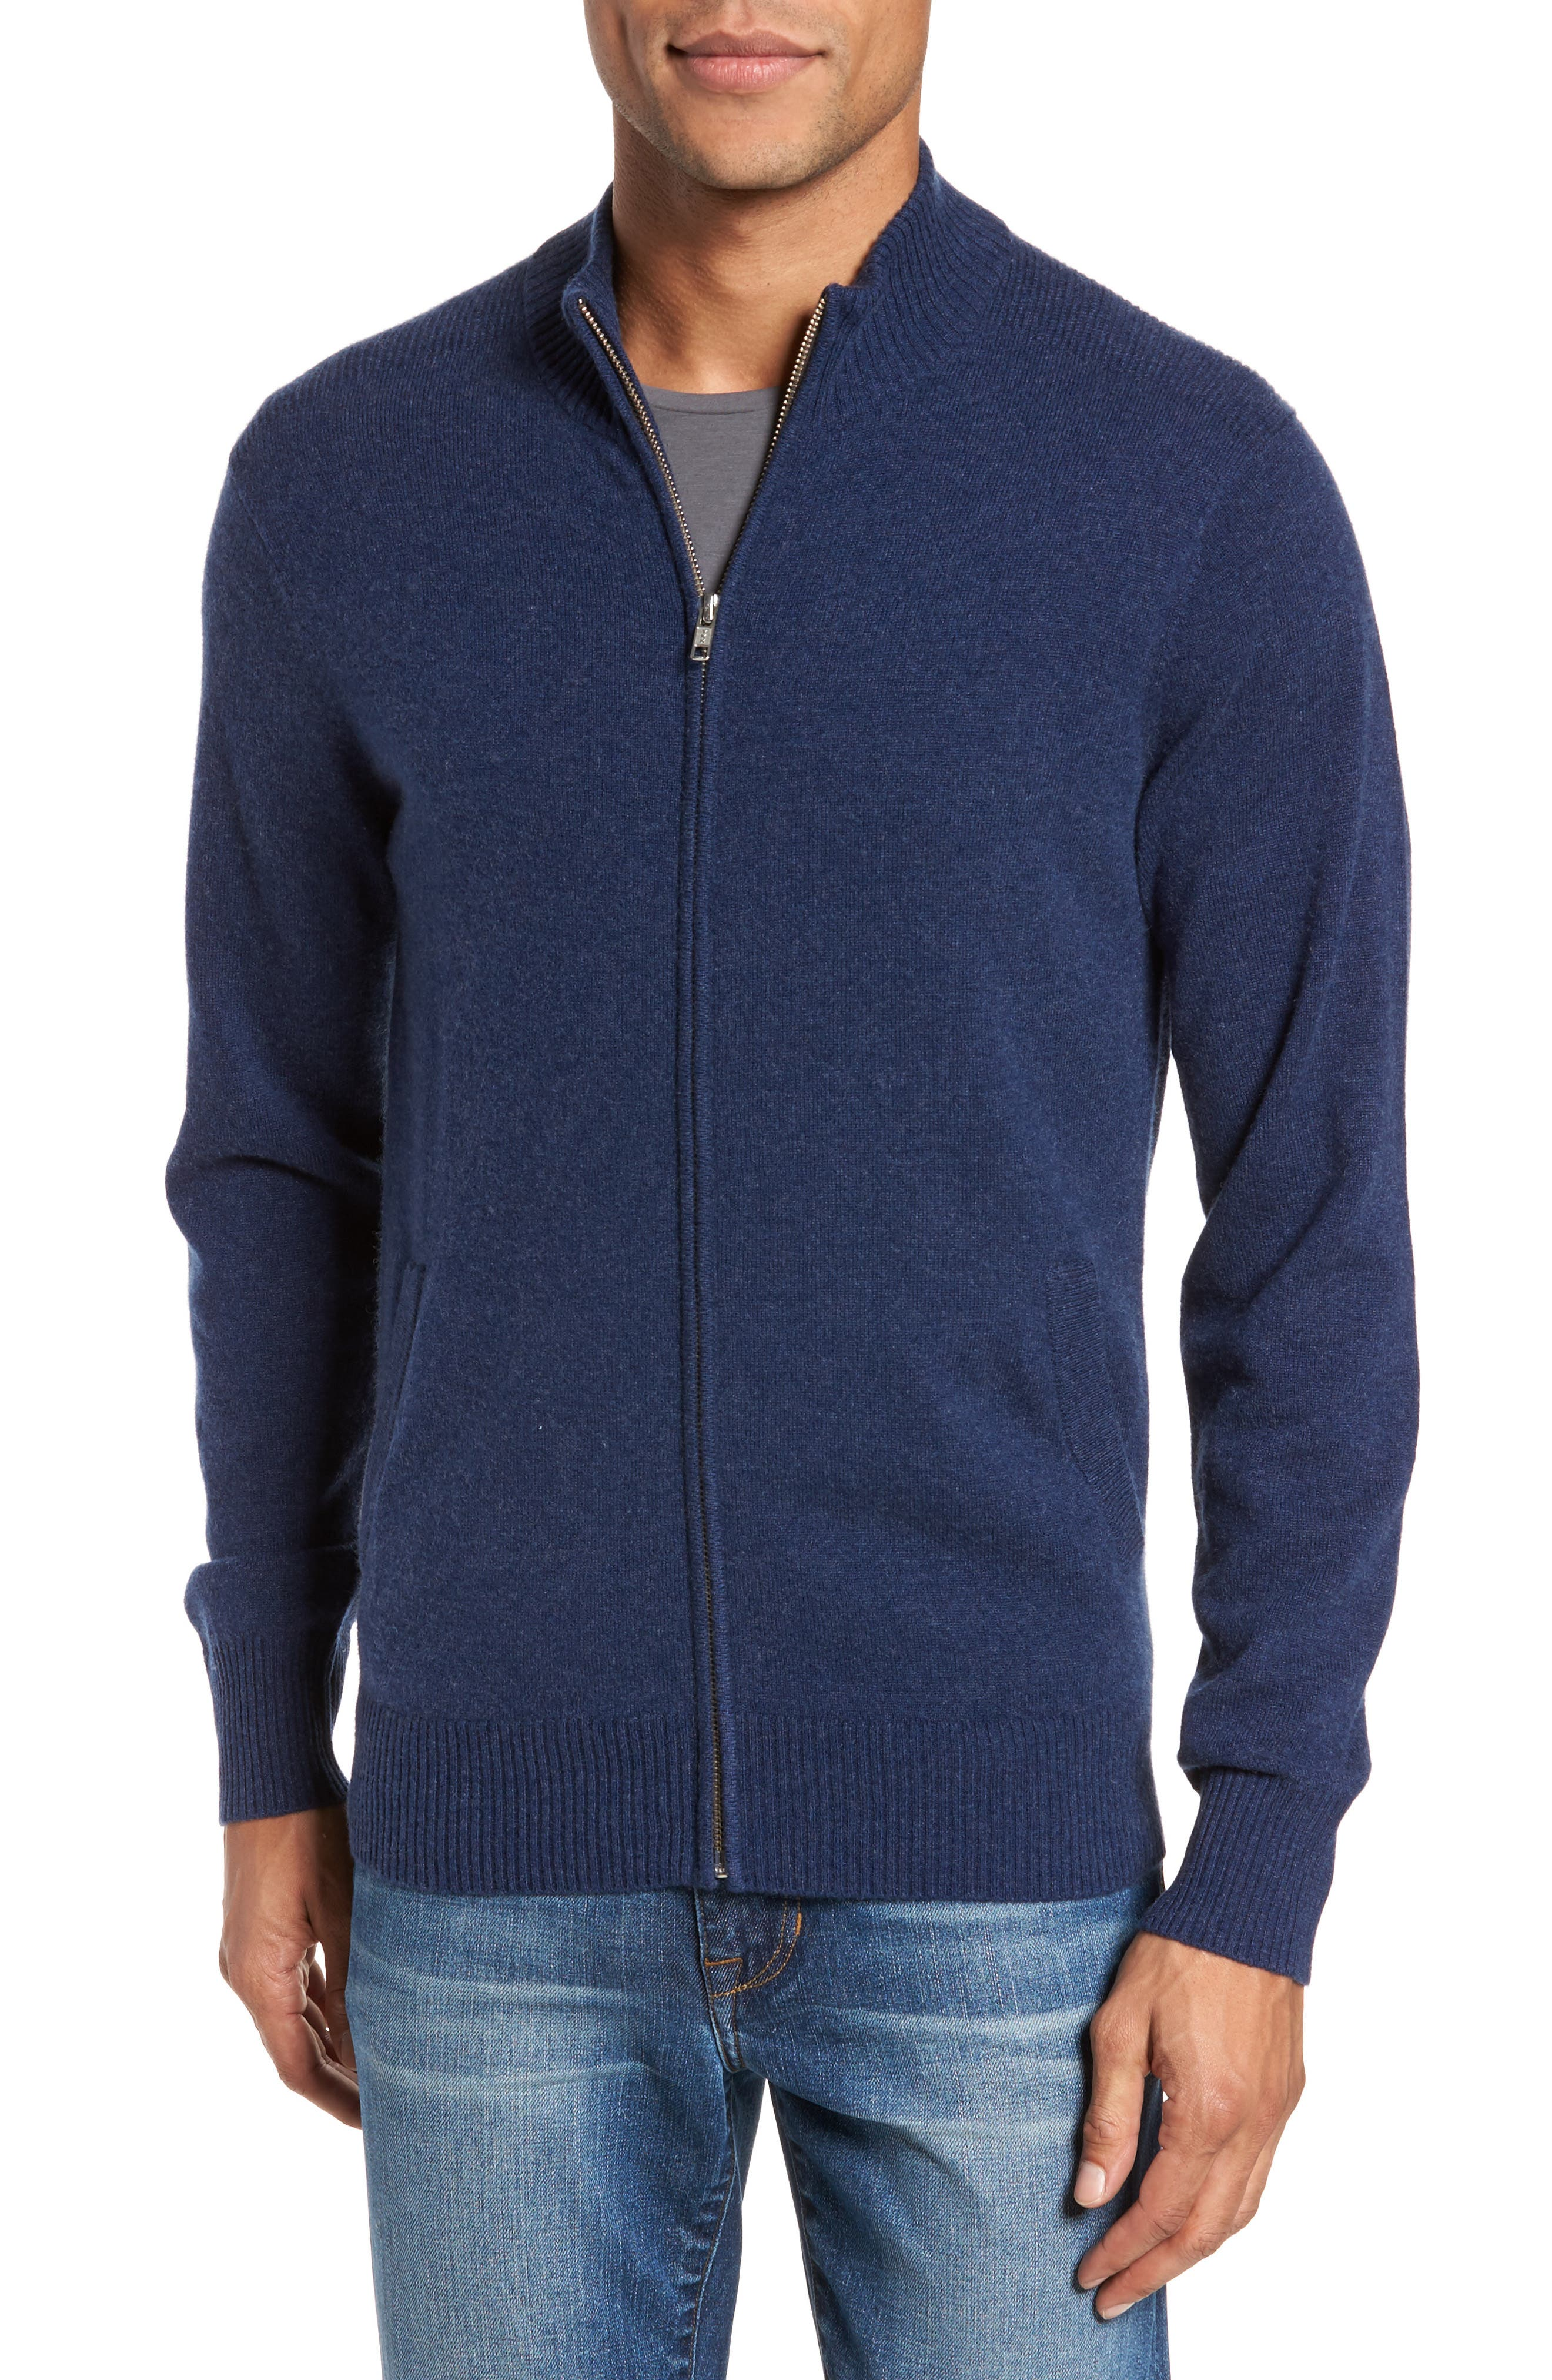 Bonobos Cashmere Zip Sweater